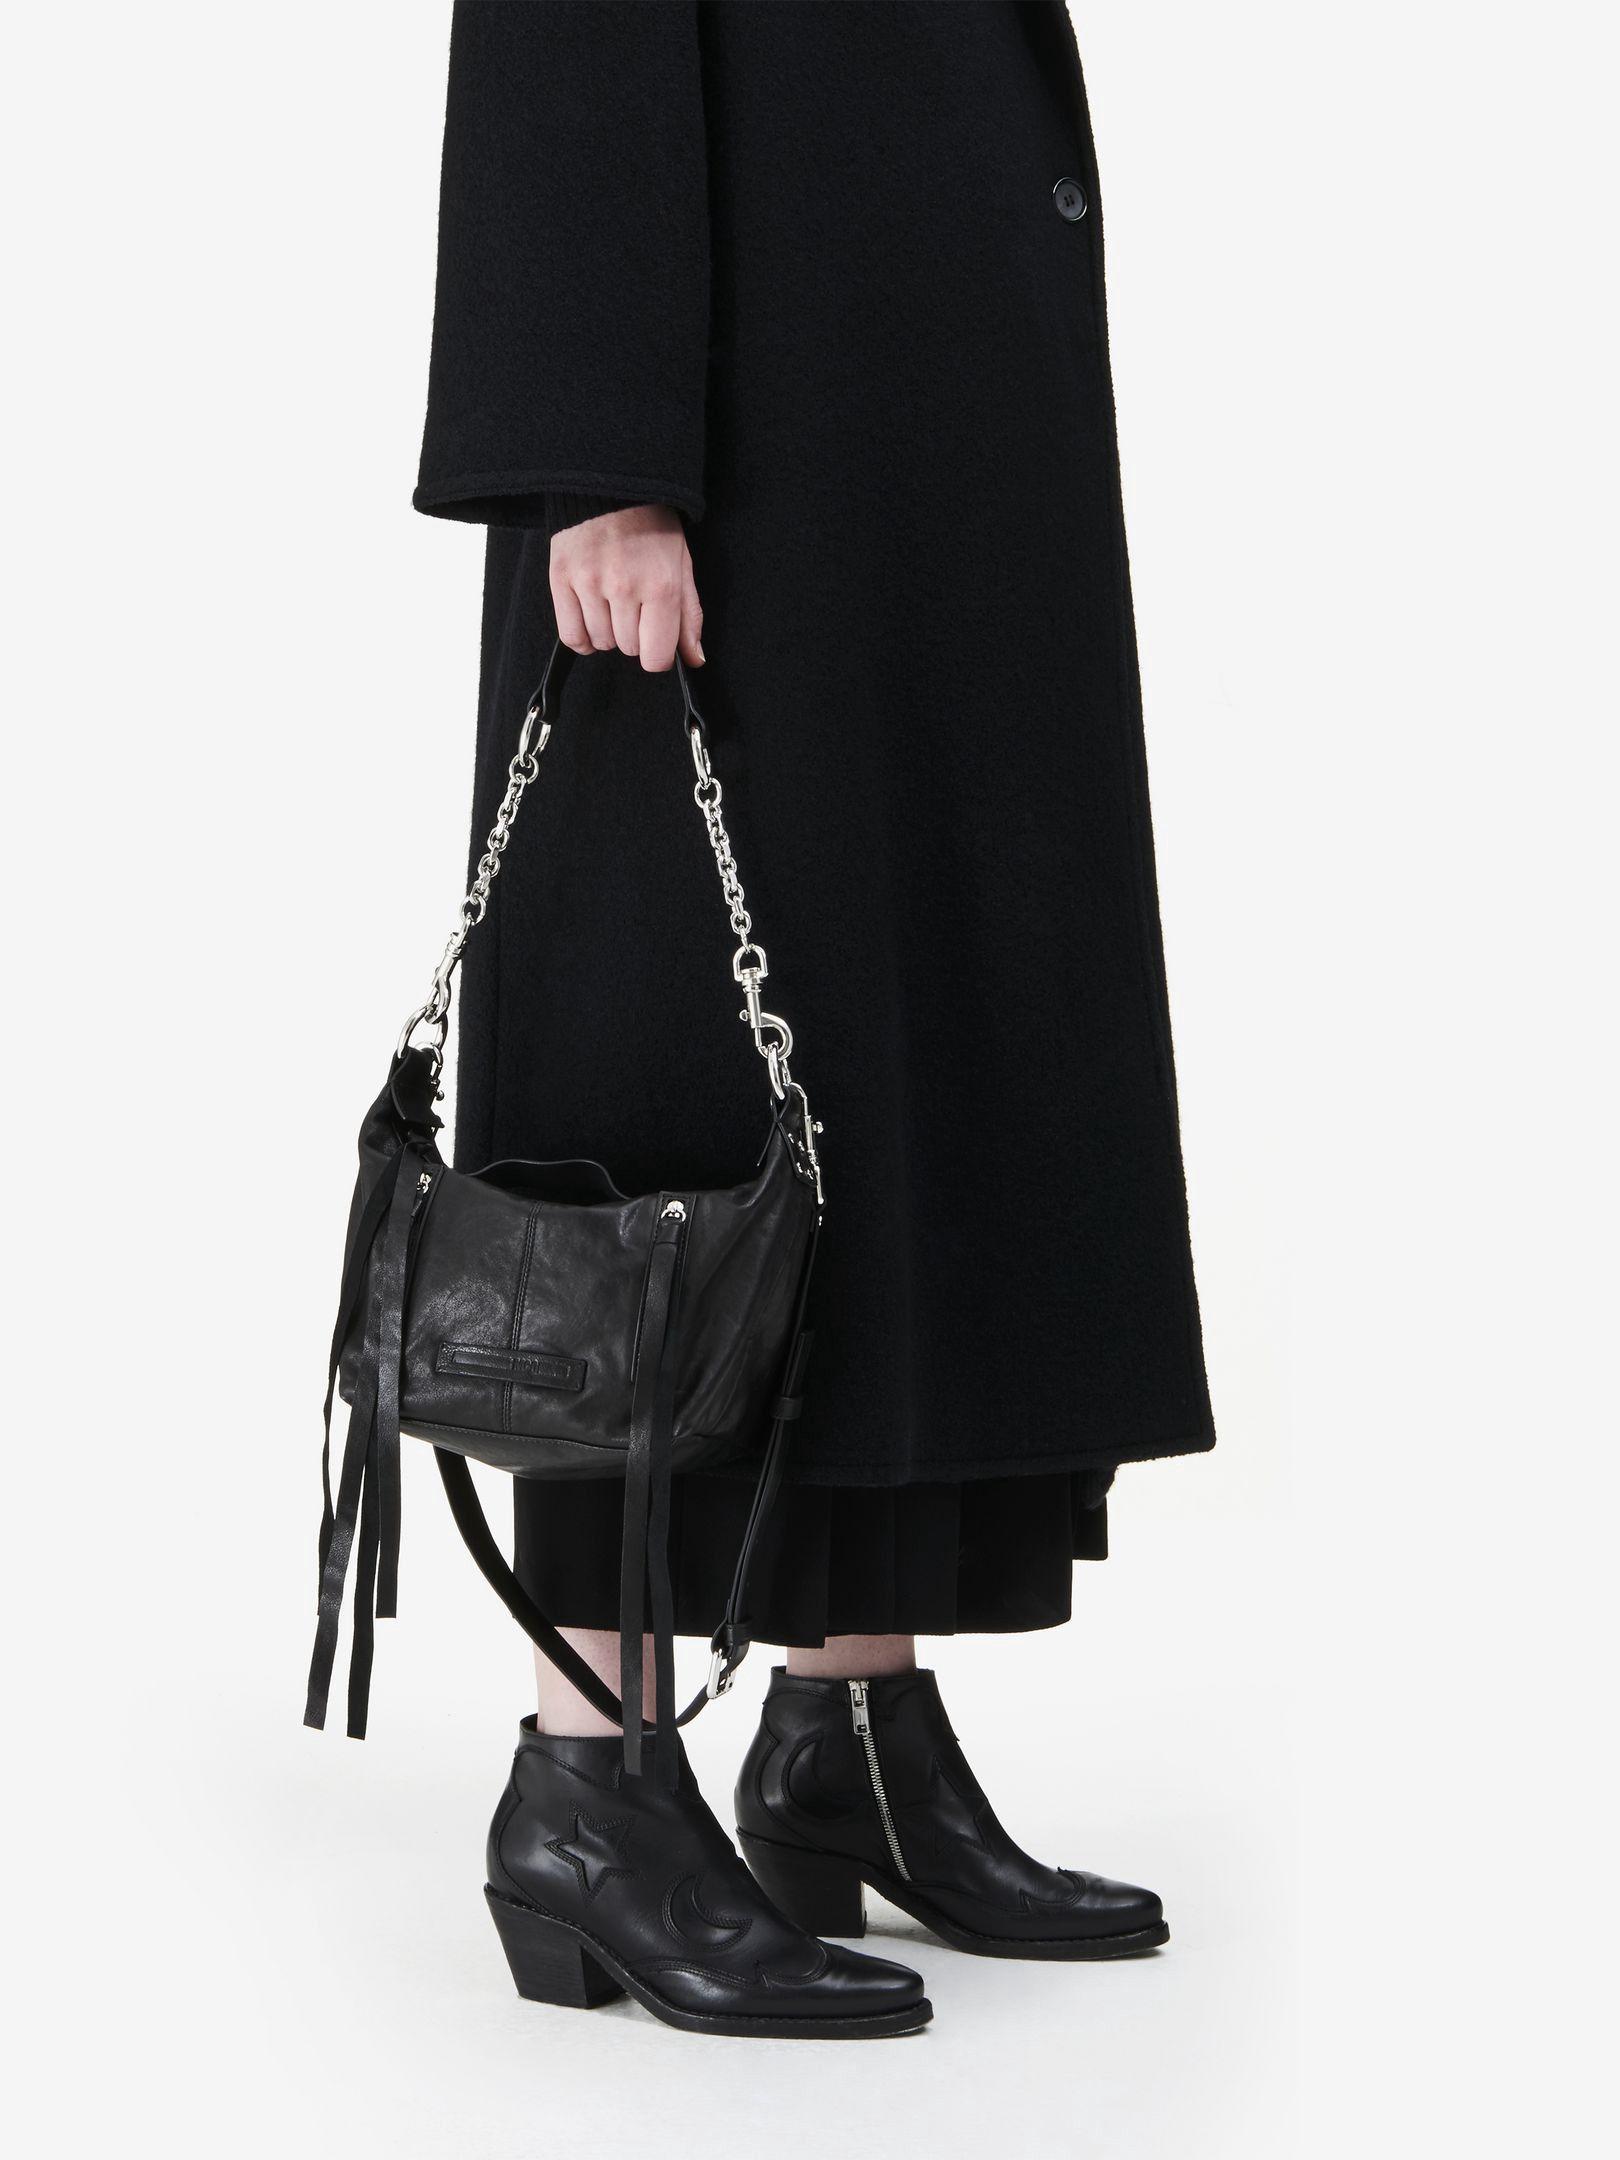 1b457b636083d MCQ BY ALEXANDER MCQUEEN Loveless Mini Hobo Bag.  mcqbyalexandermcqueen   bags  shoulder bags  leather  hobo